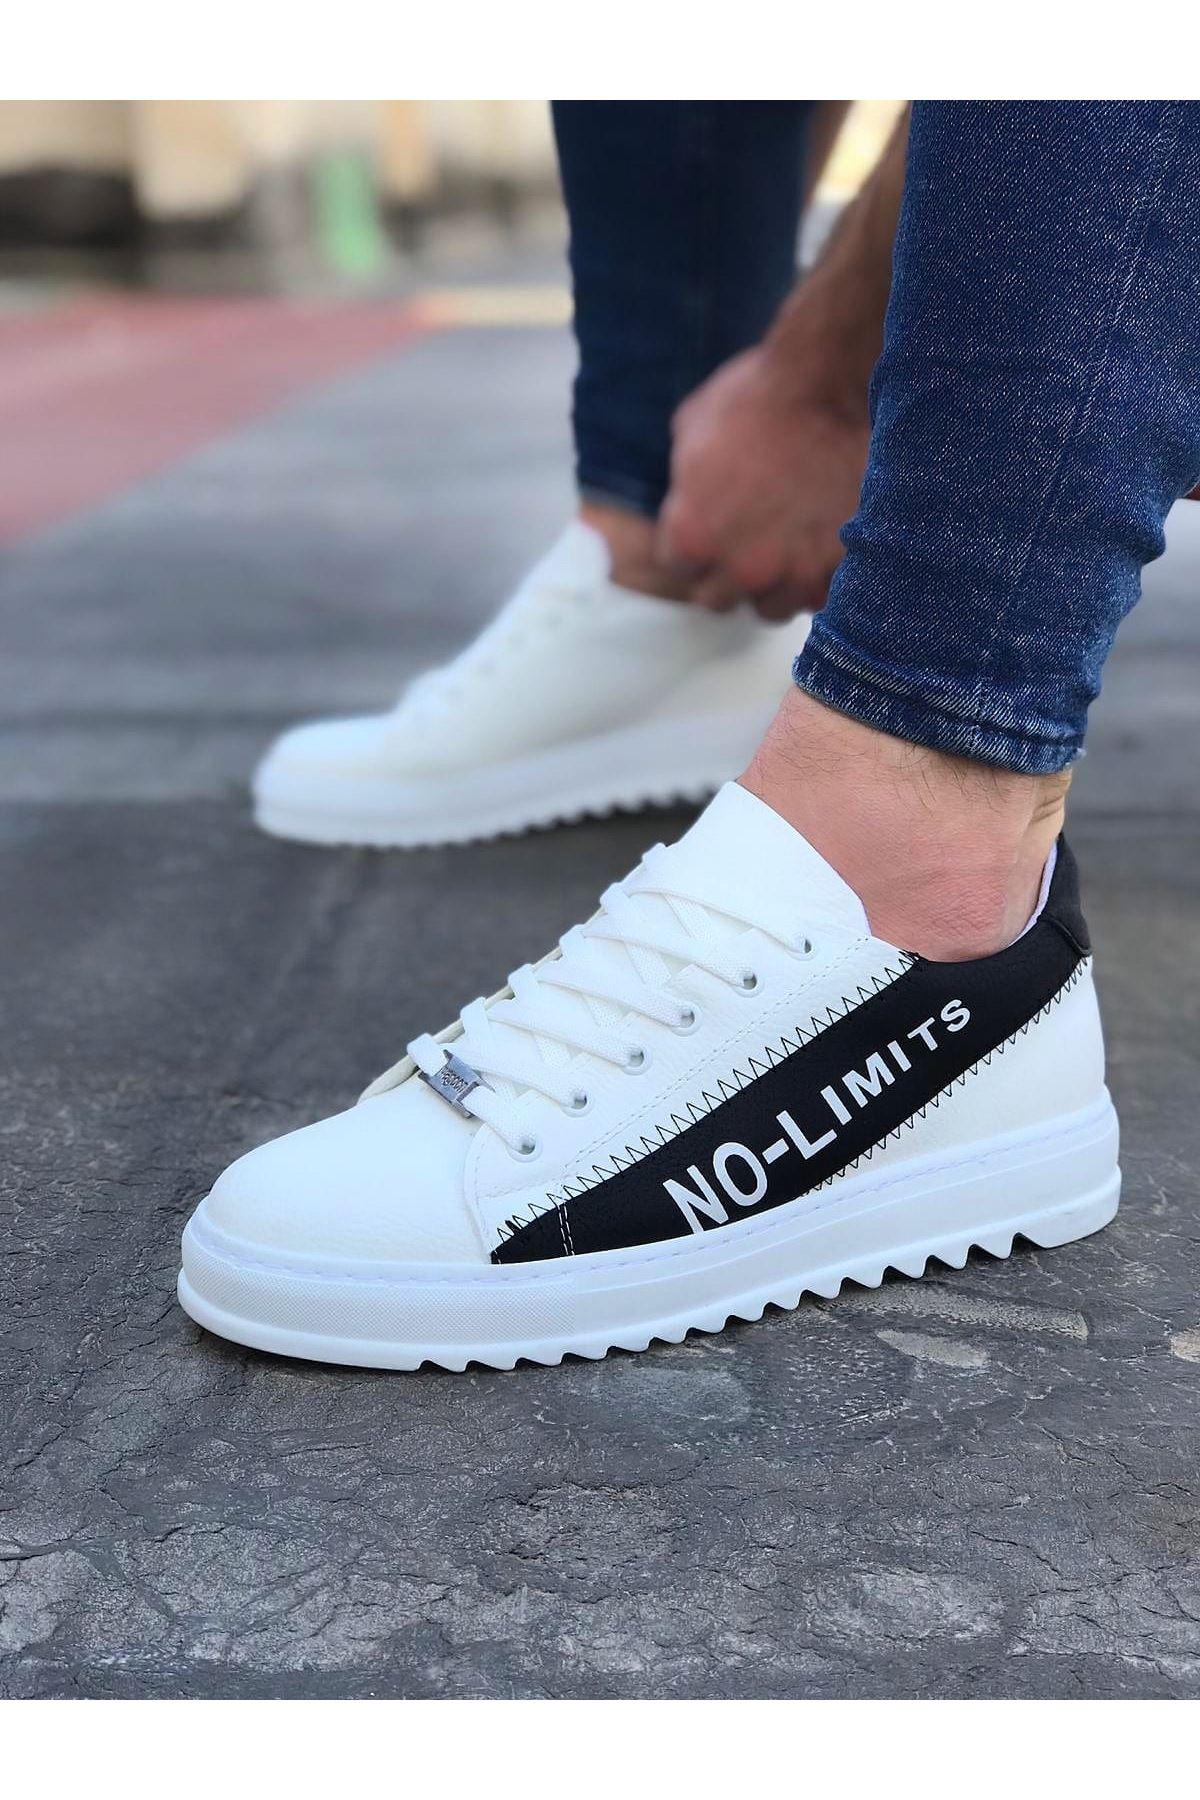 Wagoon WG027 Beyaz Siyah No Limit Erkek Casual Ayakkabı